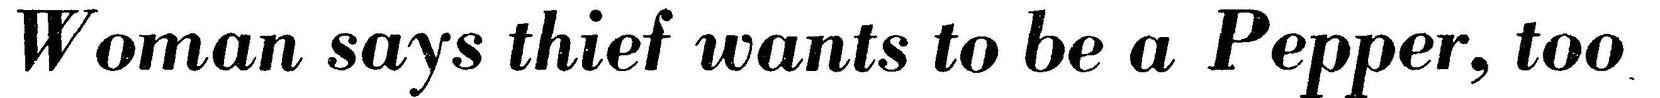 Headline published on Sept. 22, 1979.